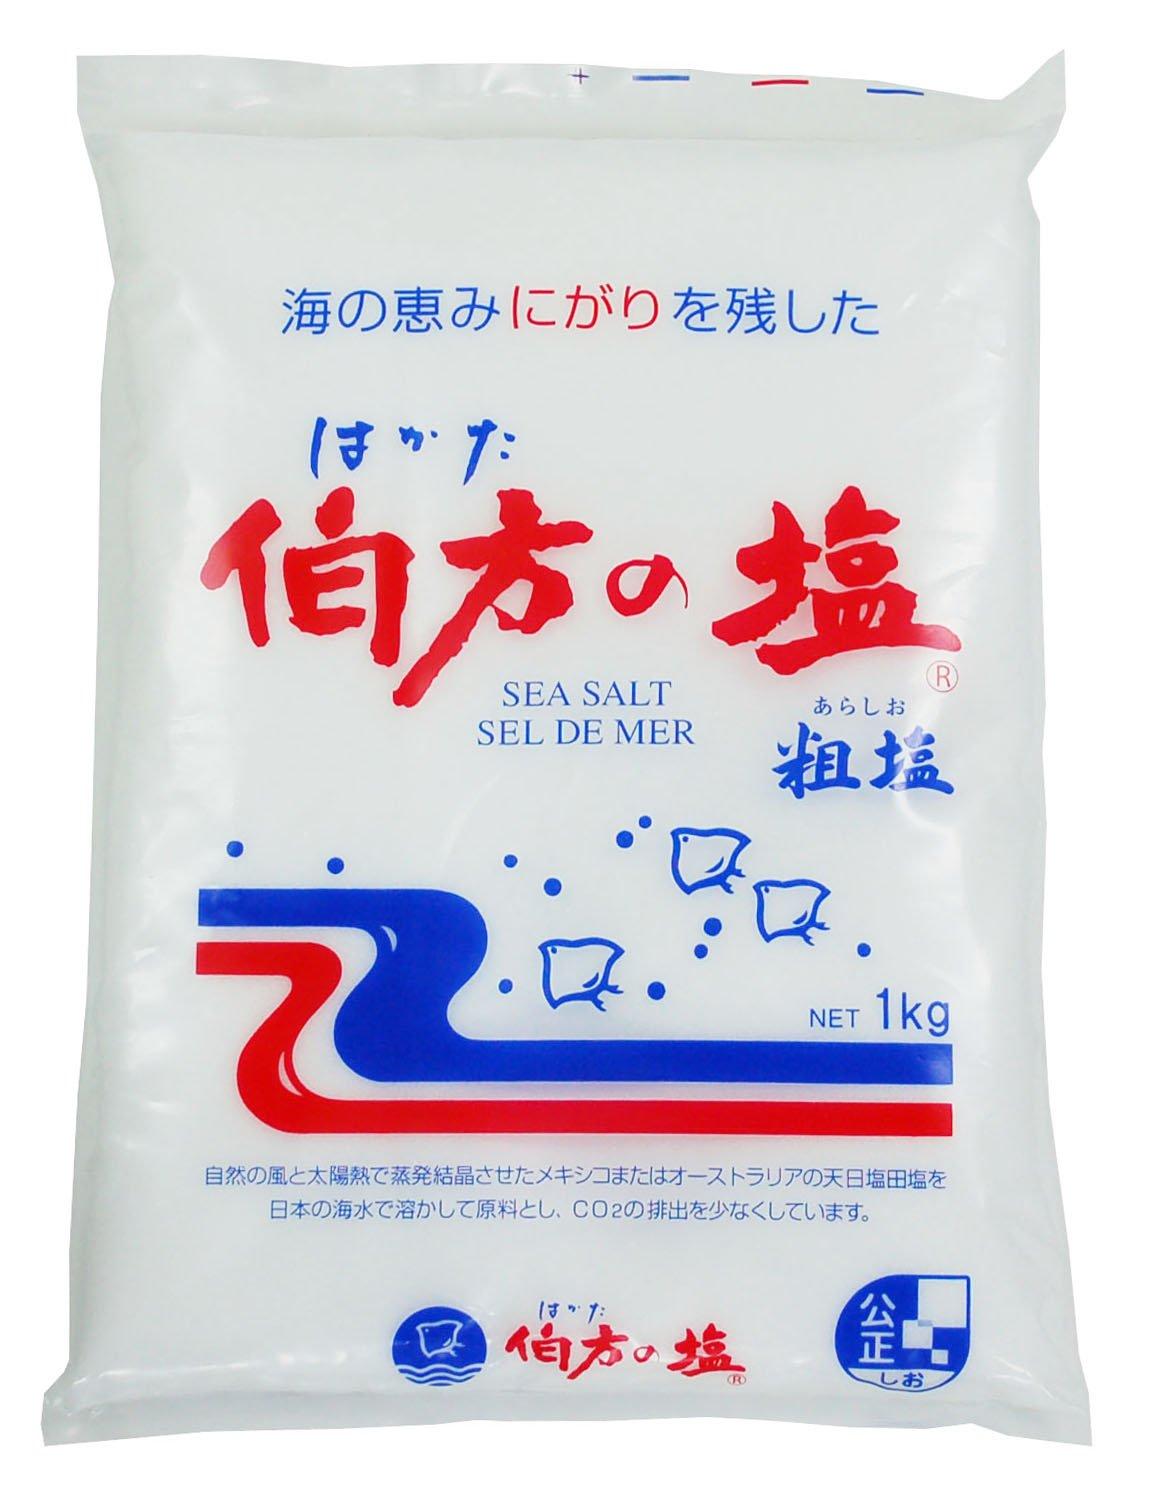 Salt of Hakata 1kg